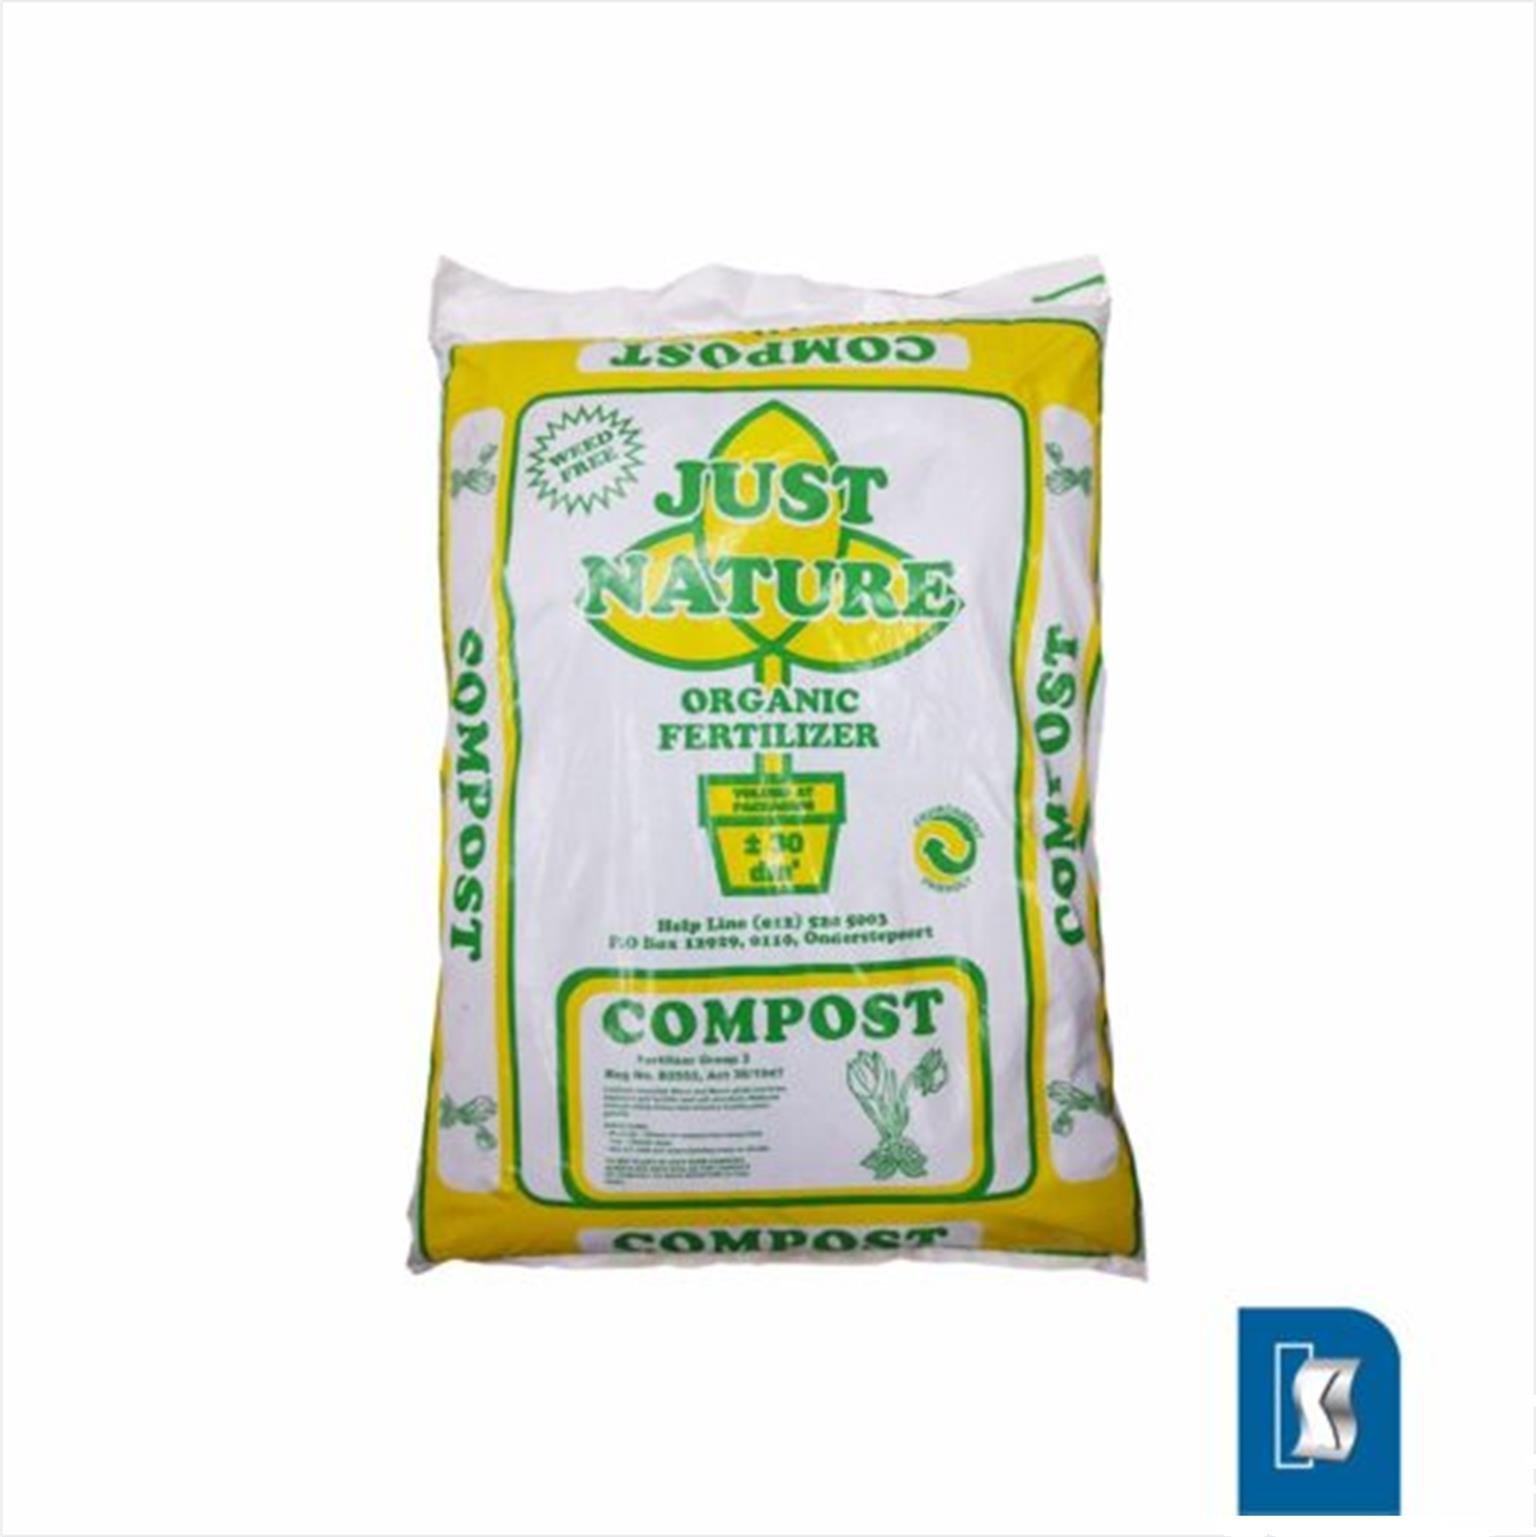 Just Nature Compost 30dm3